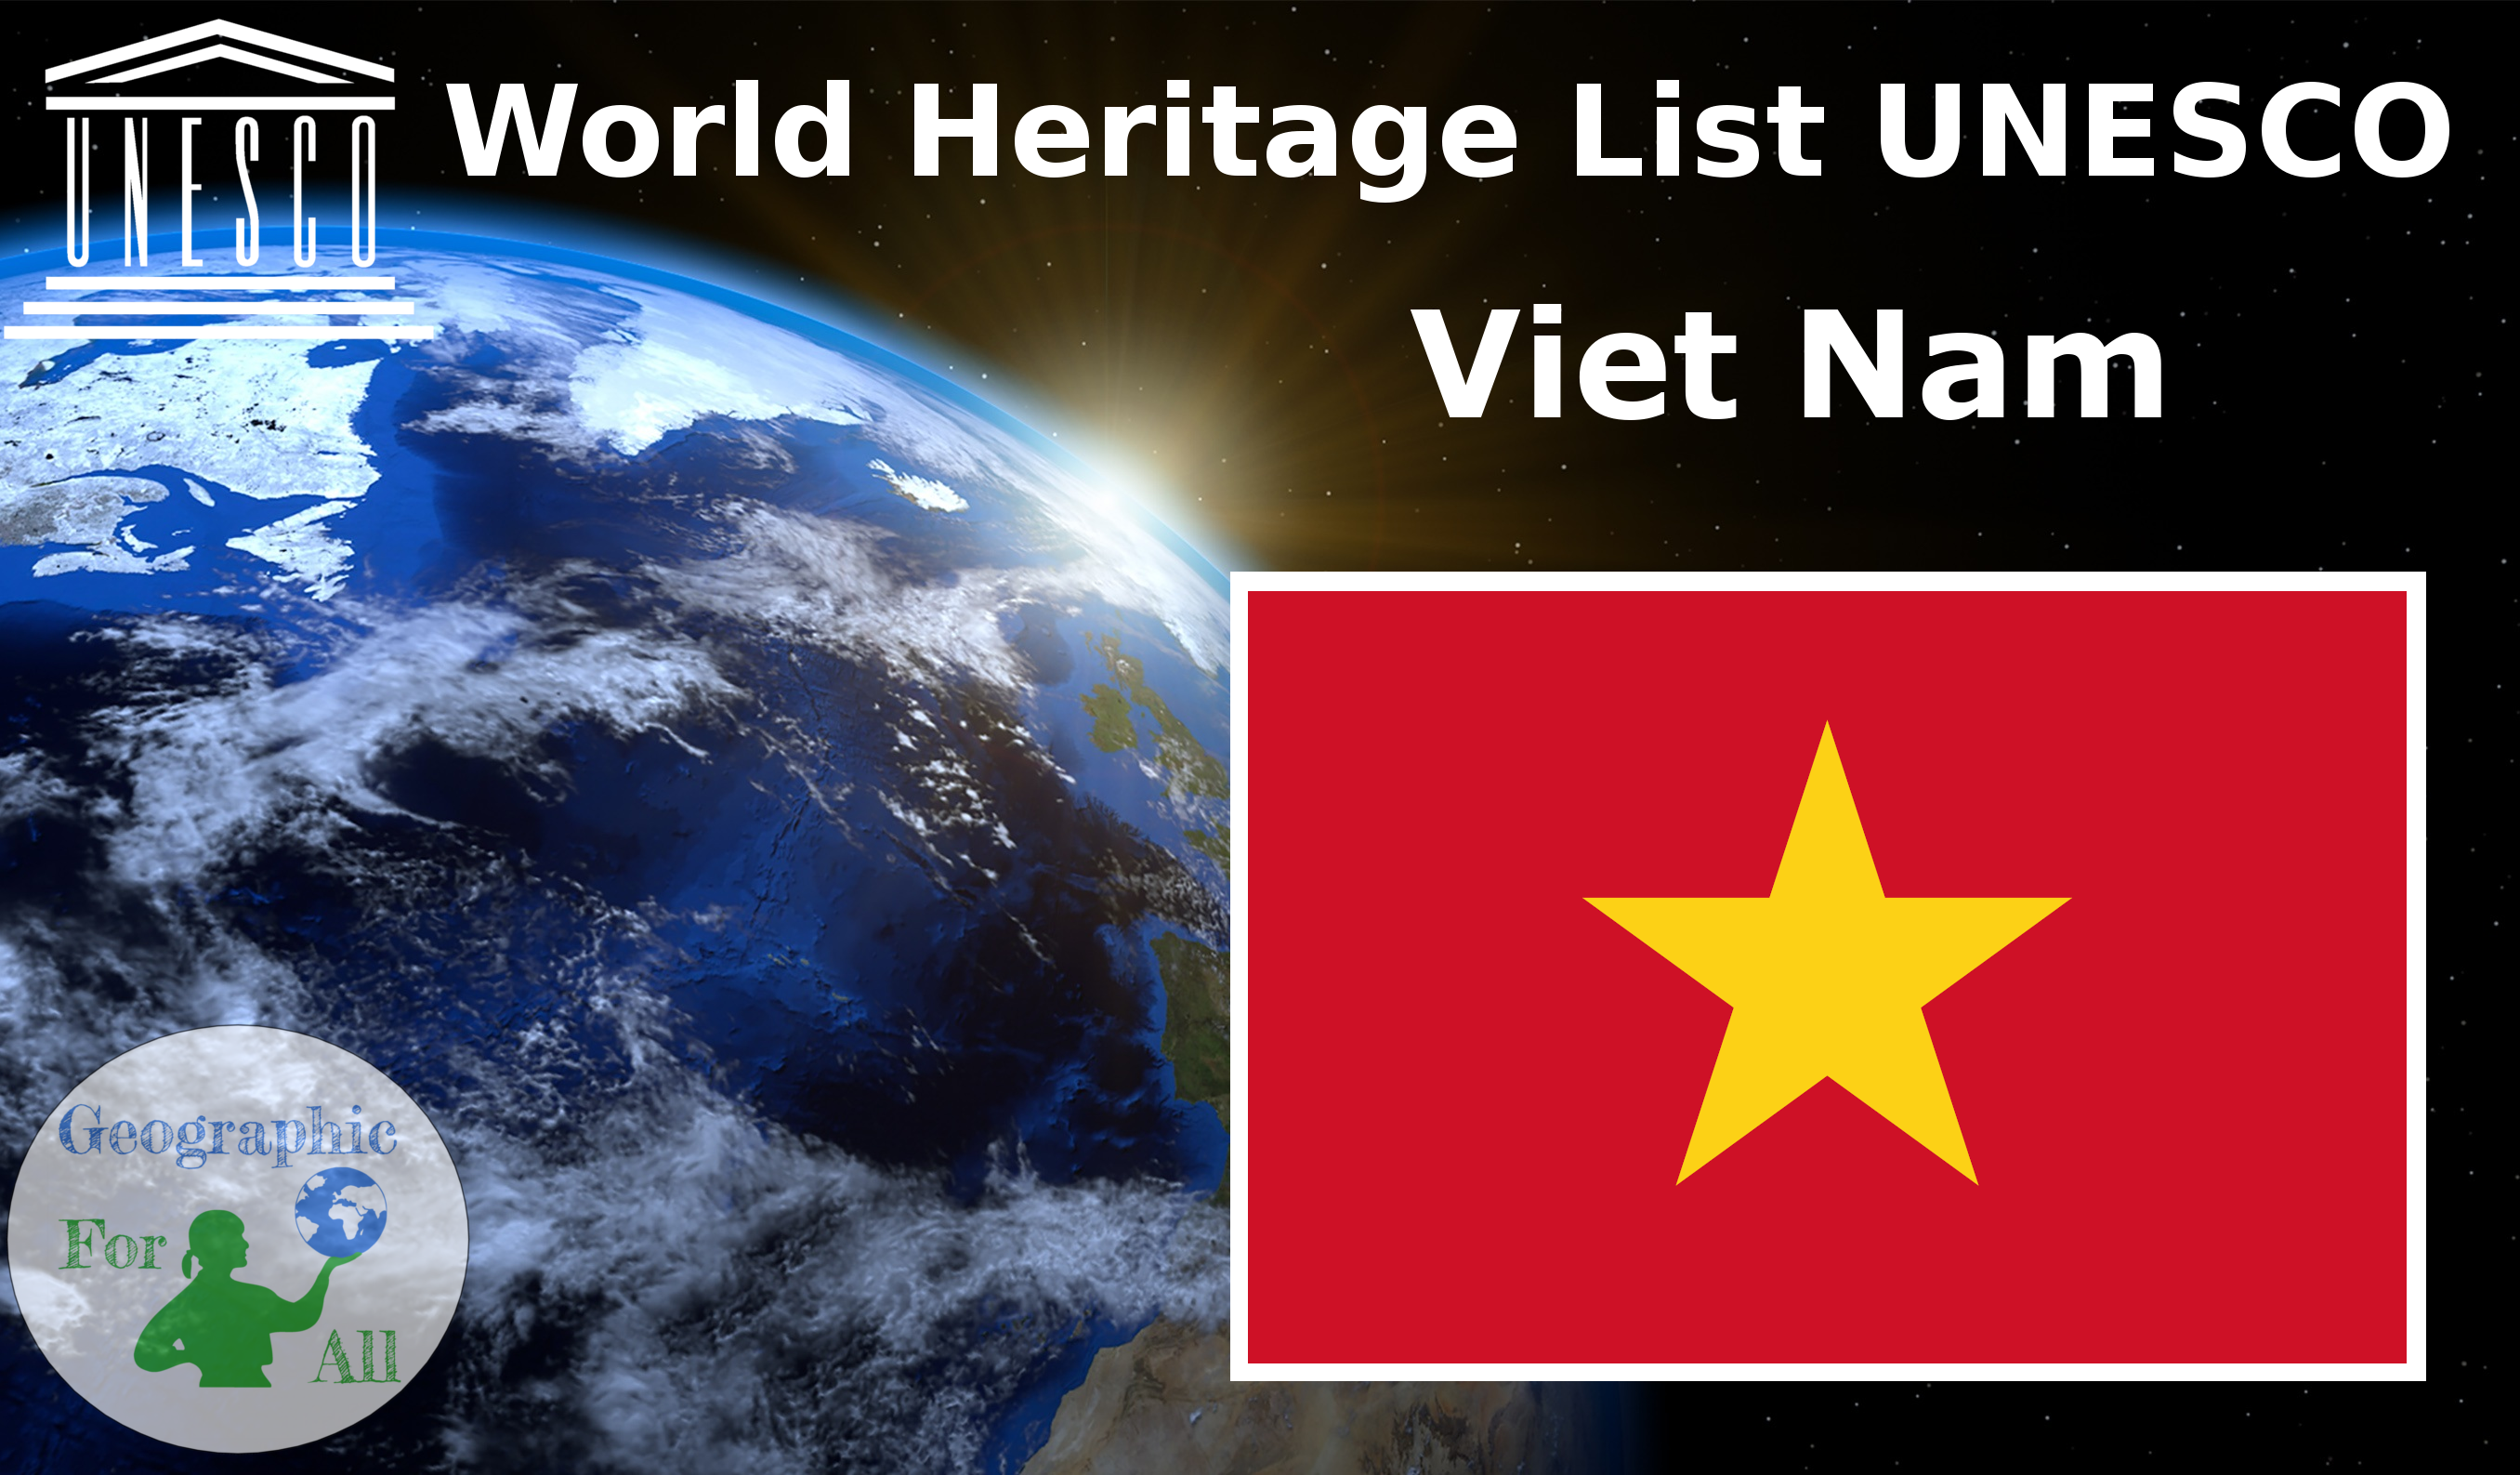 World Heritage List UNESCO - Viet Nam